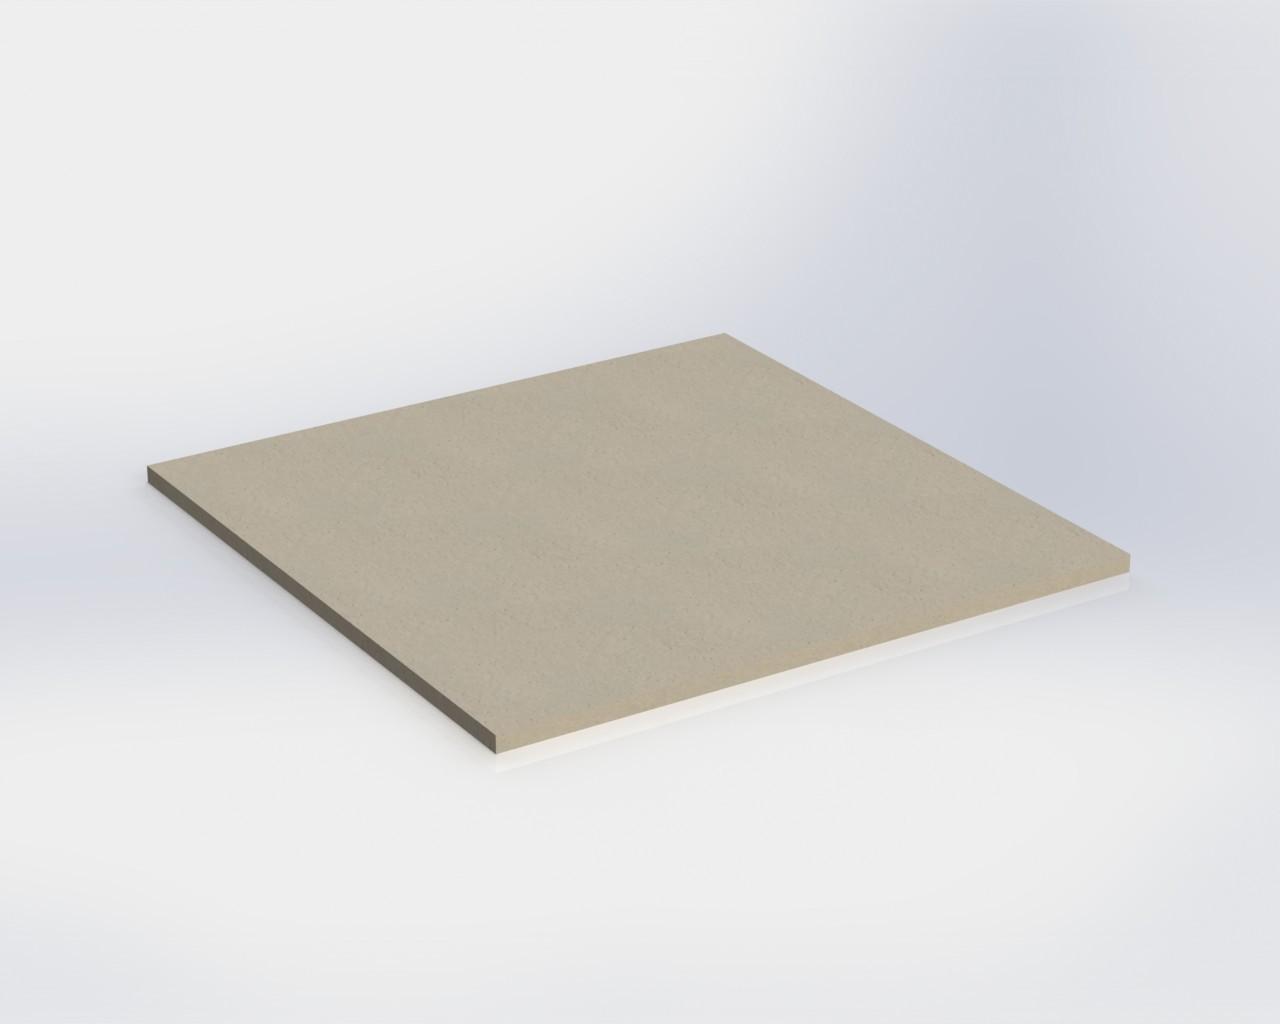 Регулируемая плита DNT 2440*1830 18 мм